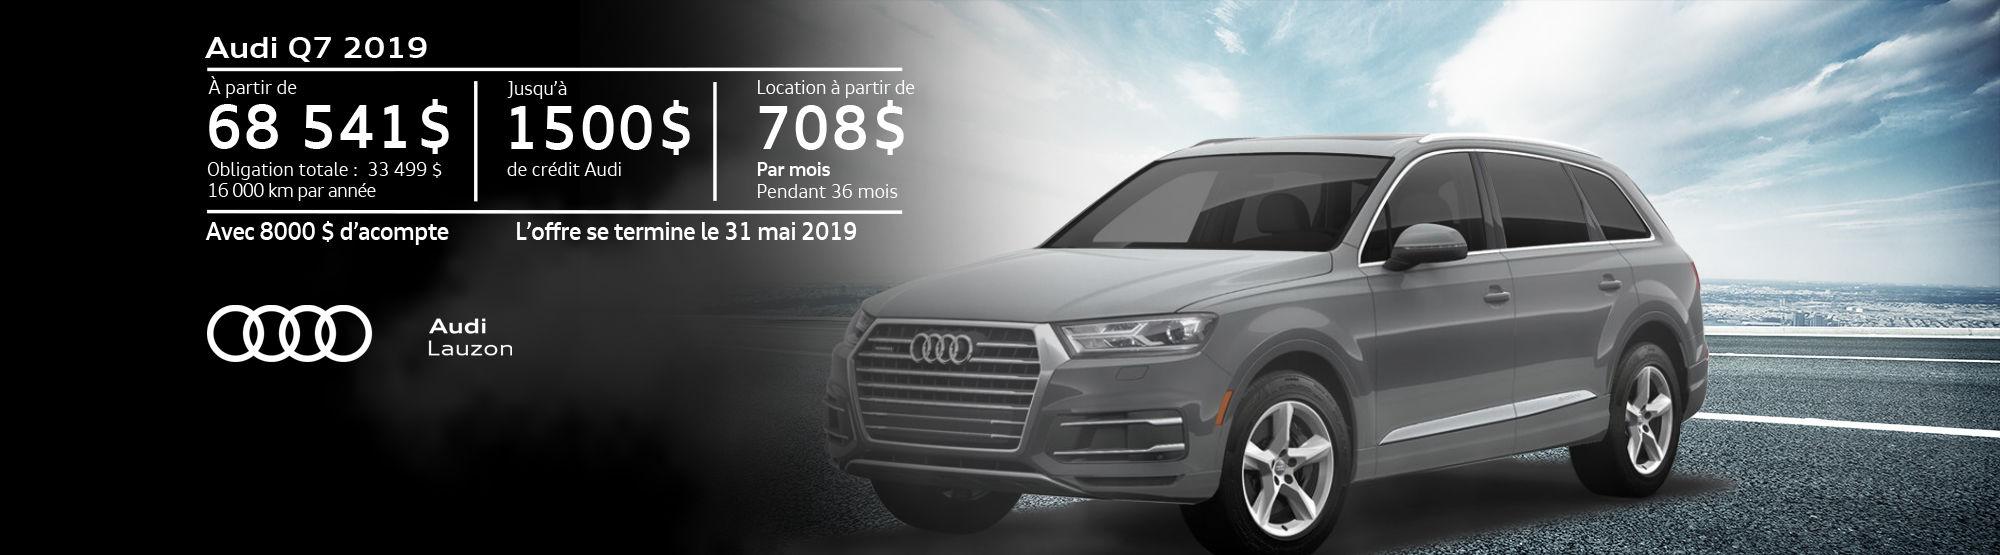 Audi Q7 mai 2019